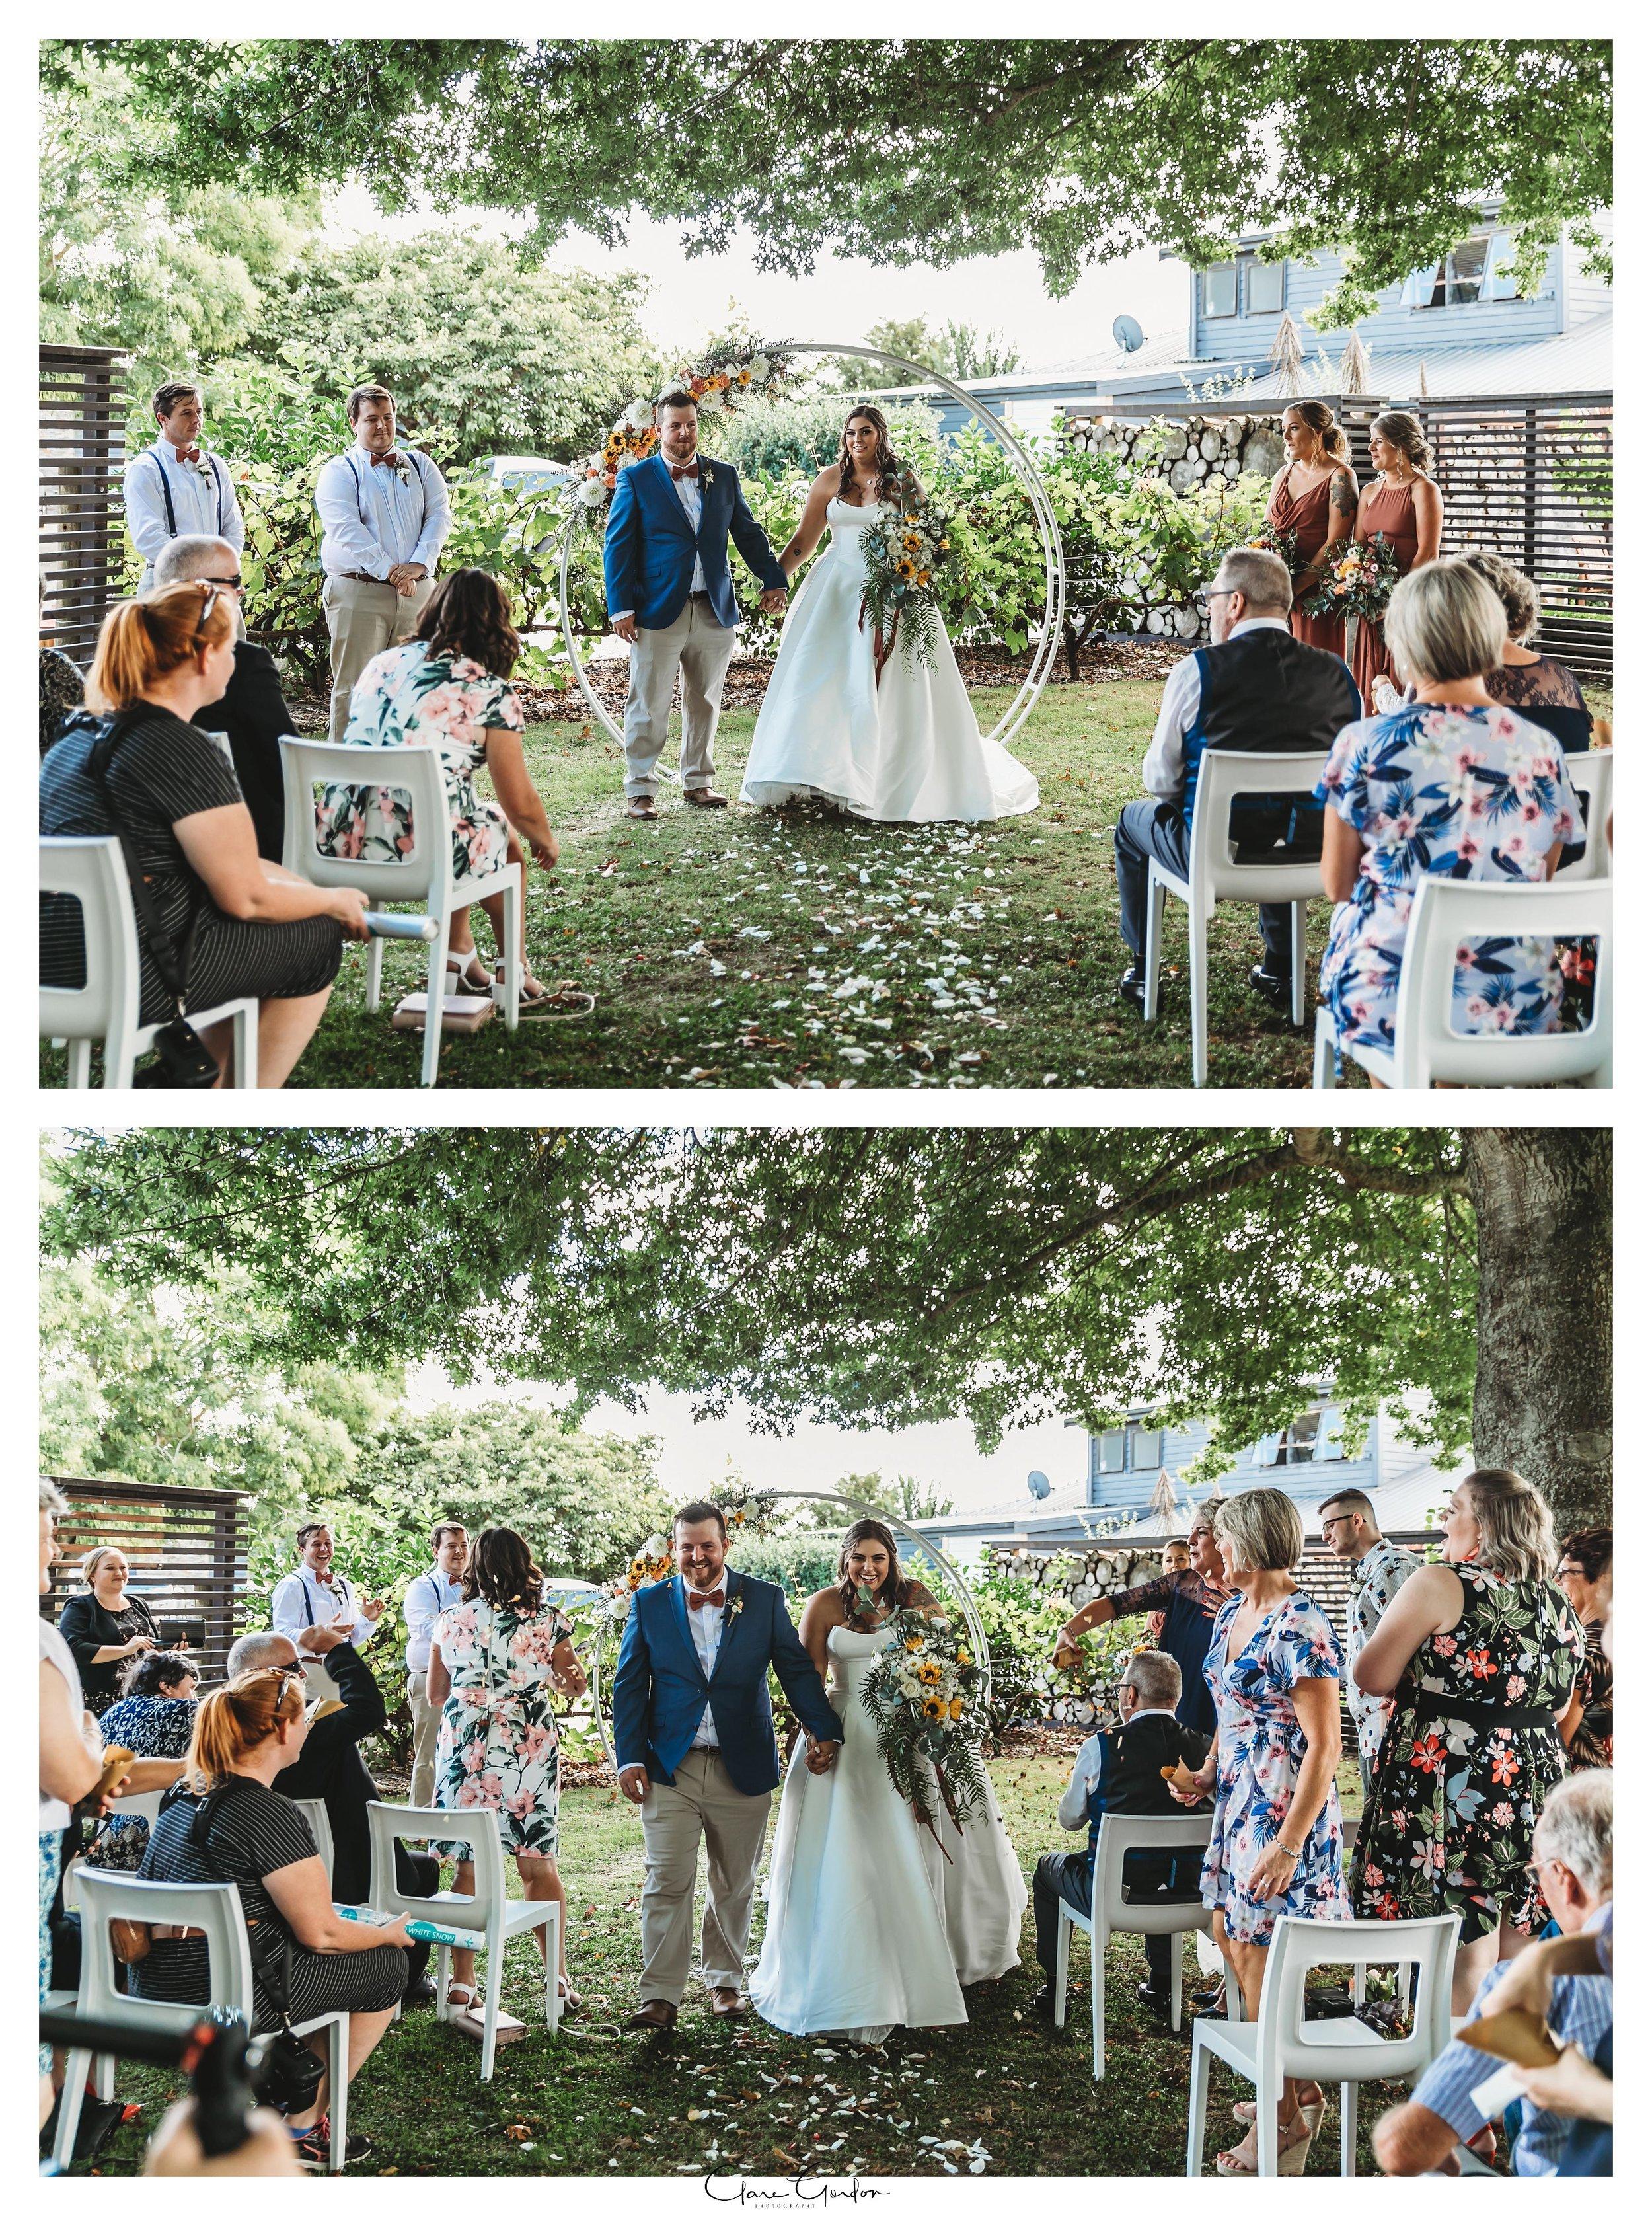 Confetti-canon-bride-and-groom-wedding-photo-waikato-wedding-photographer